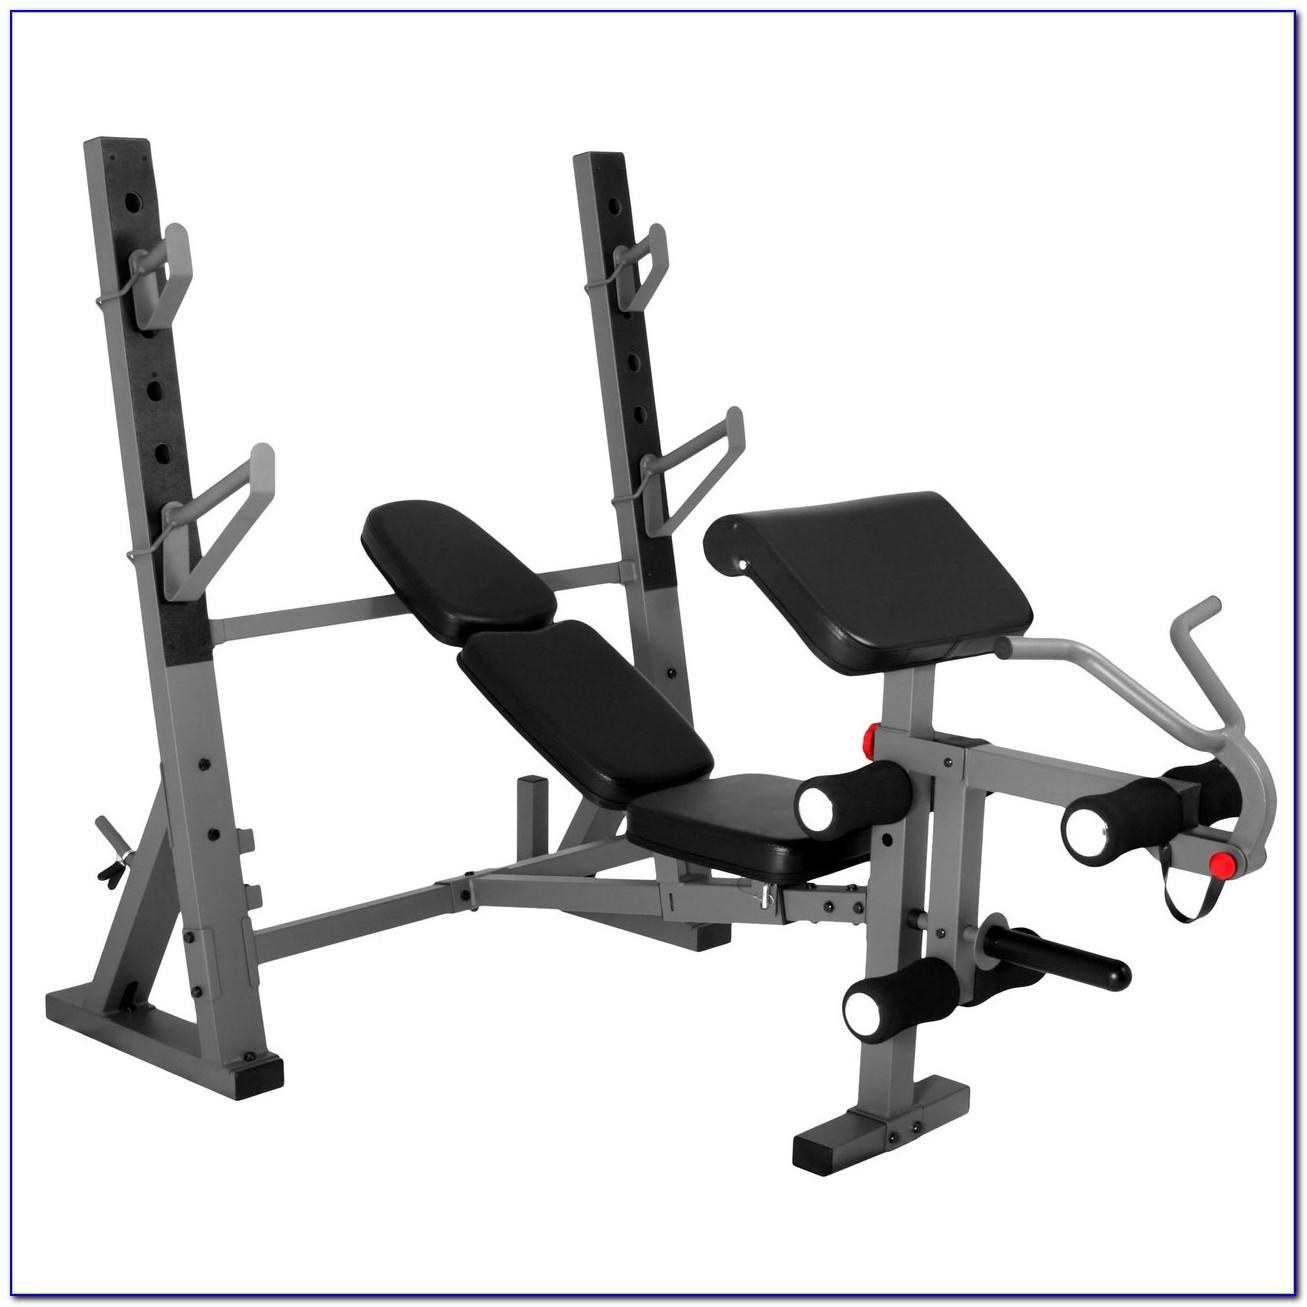 Self Spotting Bench Press Bar Weight